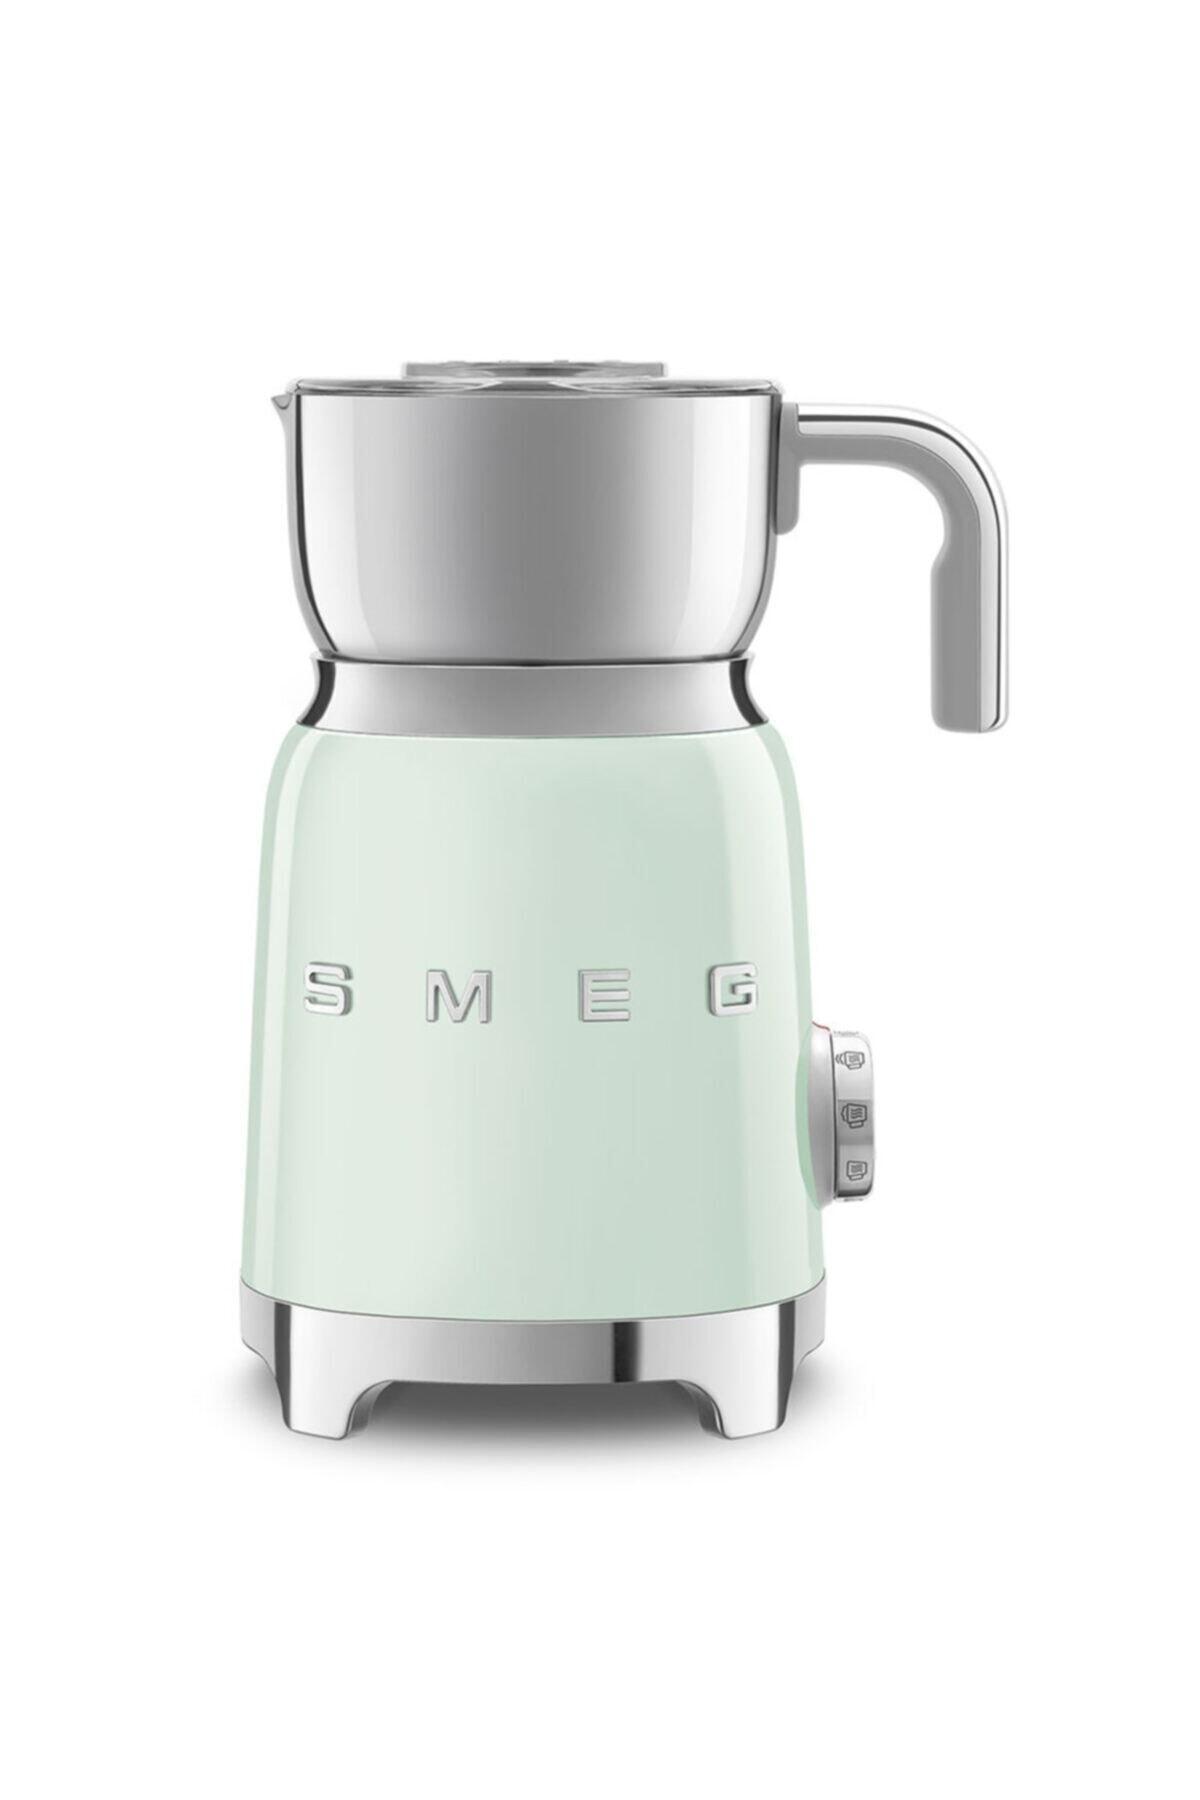 SMEG Mff01pgeu Süt Köpürtme Makinesi Pastel Yeşil 1